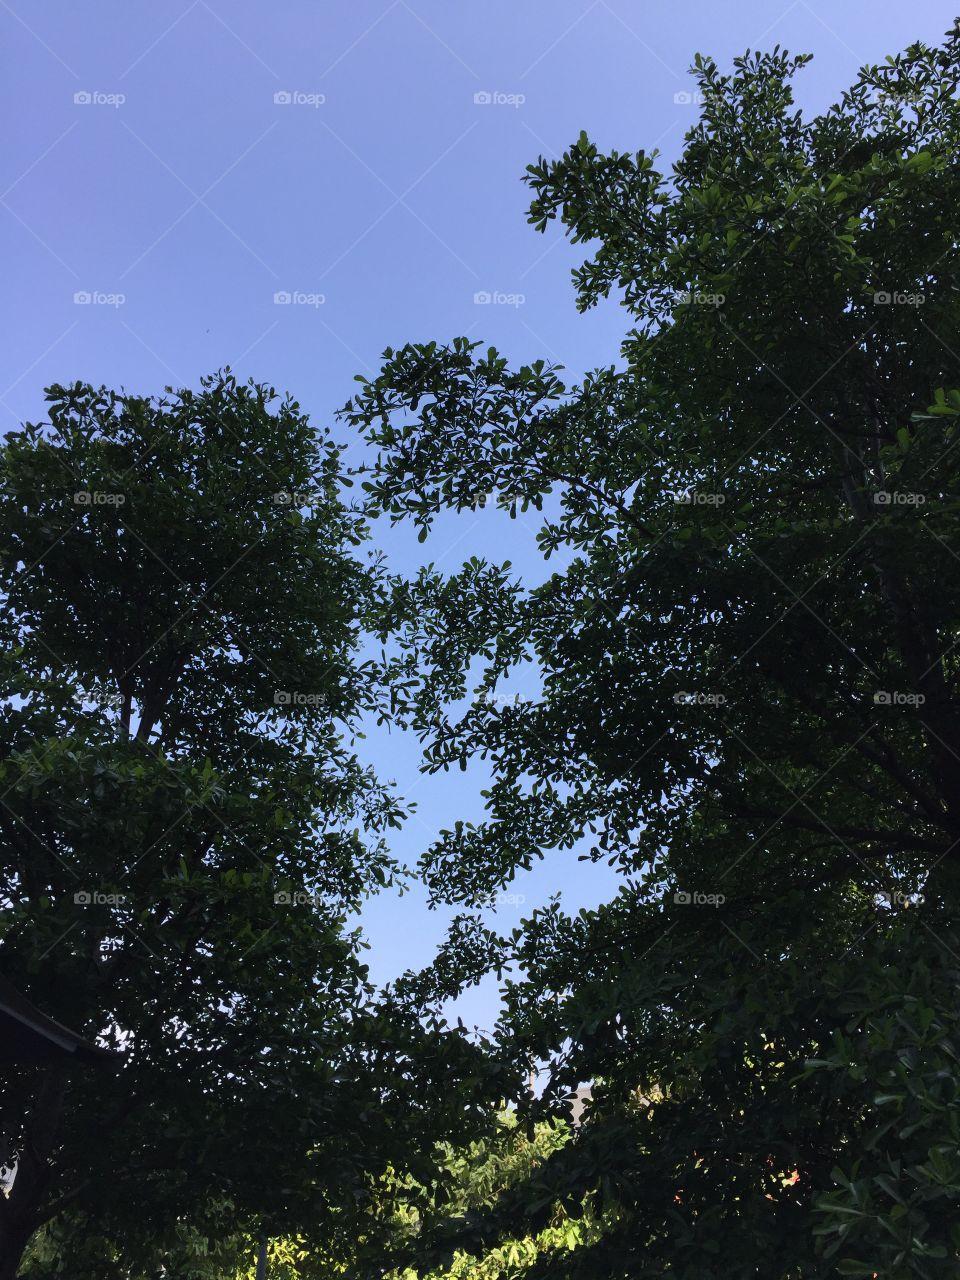 Green tree and blue sky. Taken from Kuala Lumpur